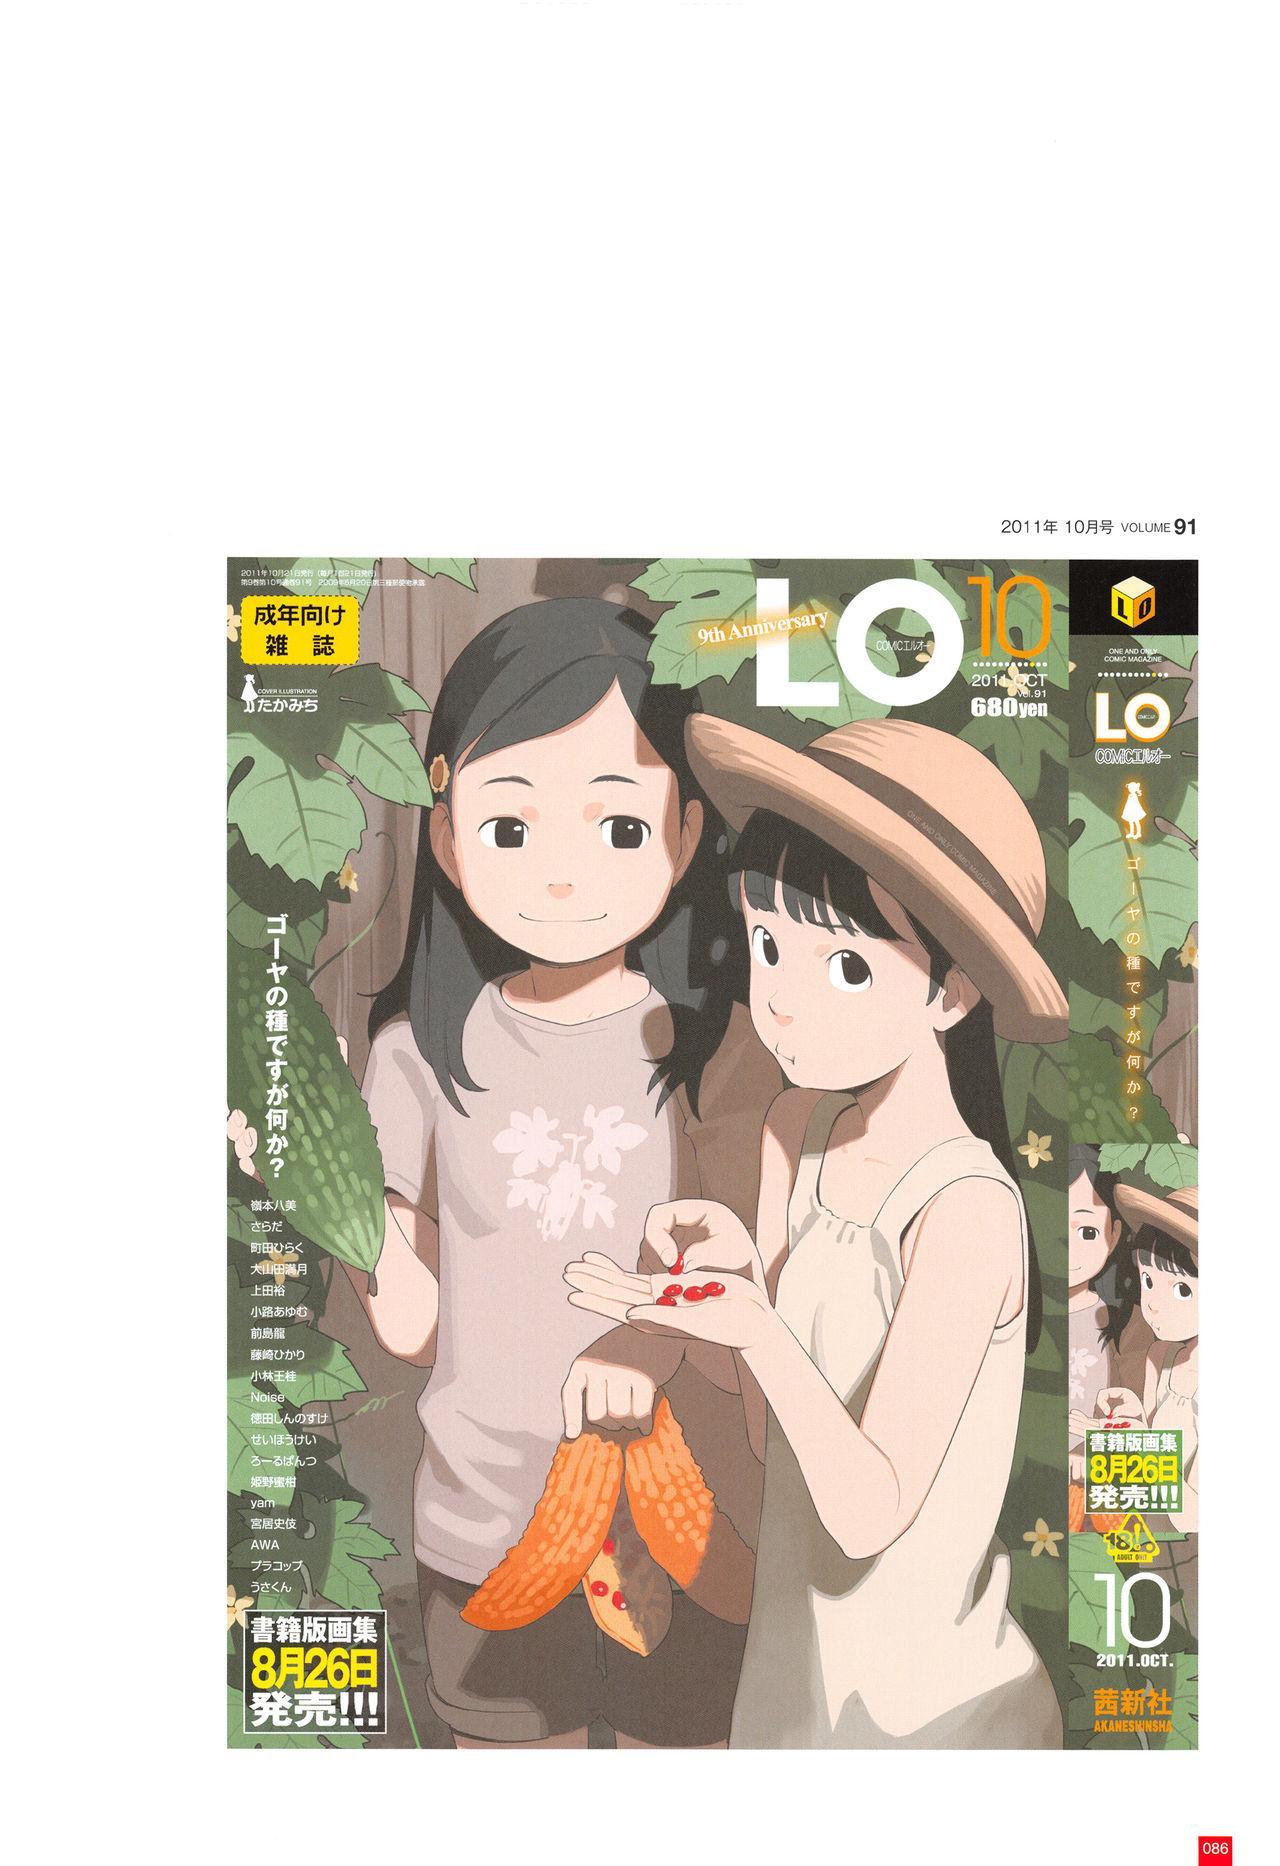 LO Artbook 2-A TAKAMICHI LOOP WORKS 88